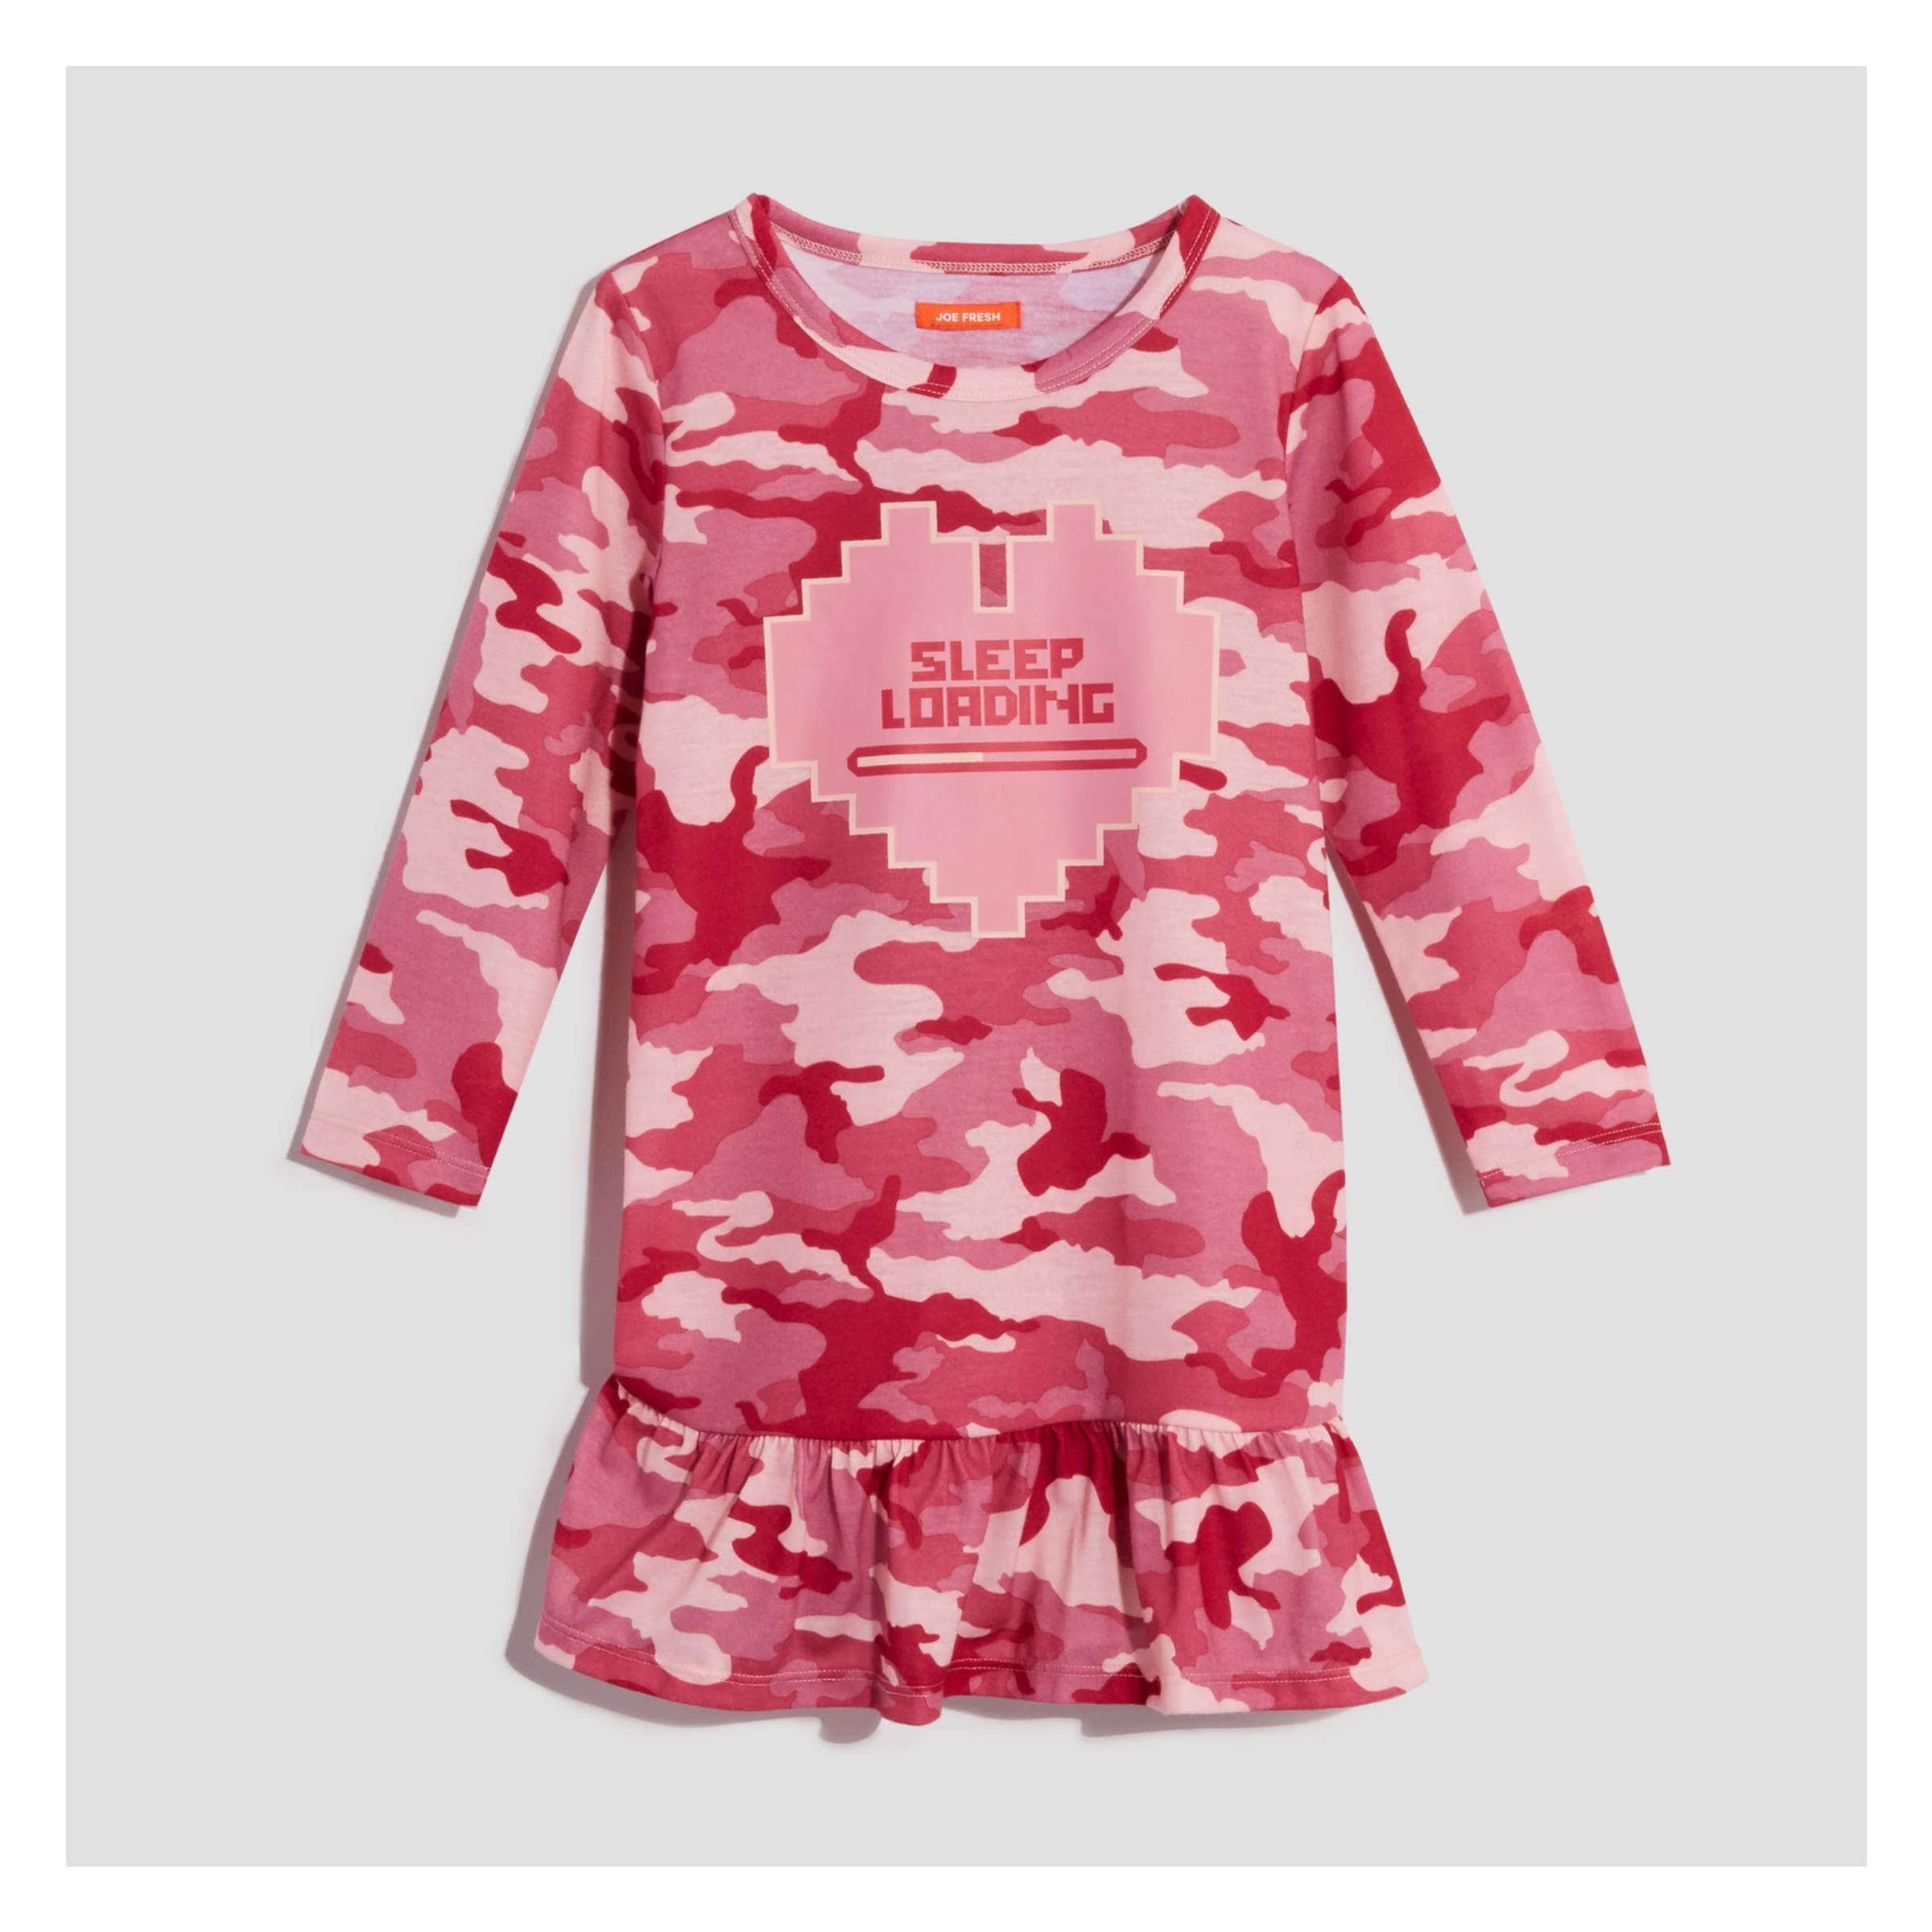 0b4944140b98ce Toddler Girls' Nightie in JF Perennial Pink from Joe Fresh